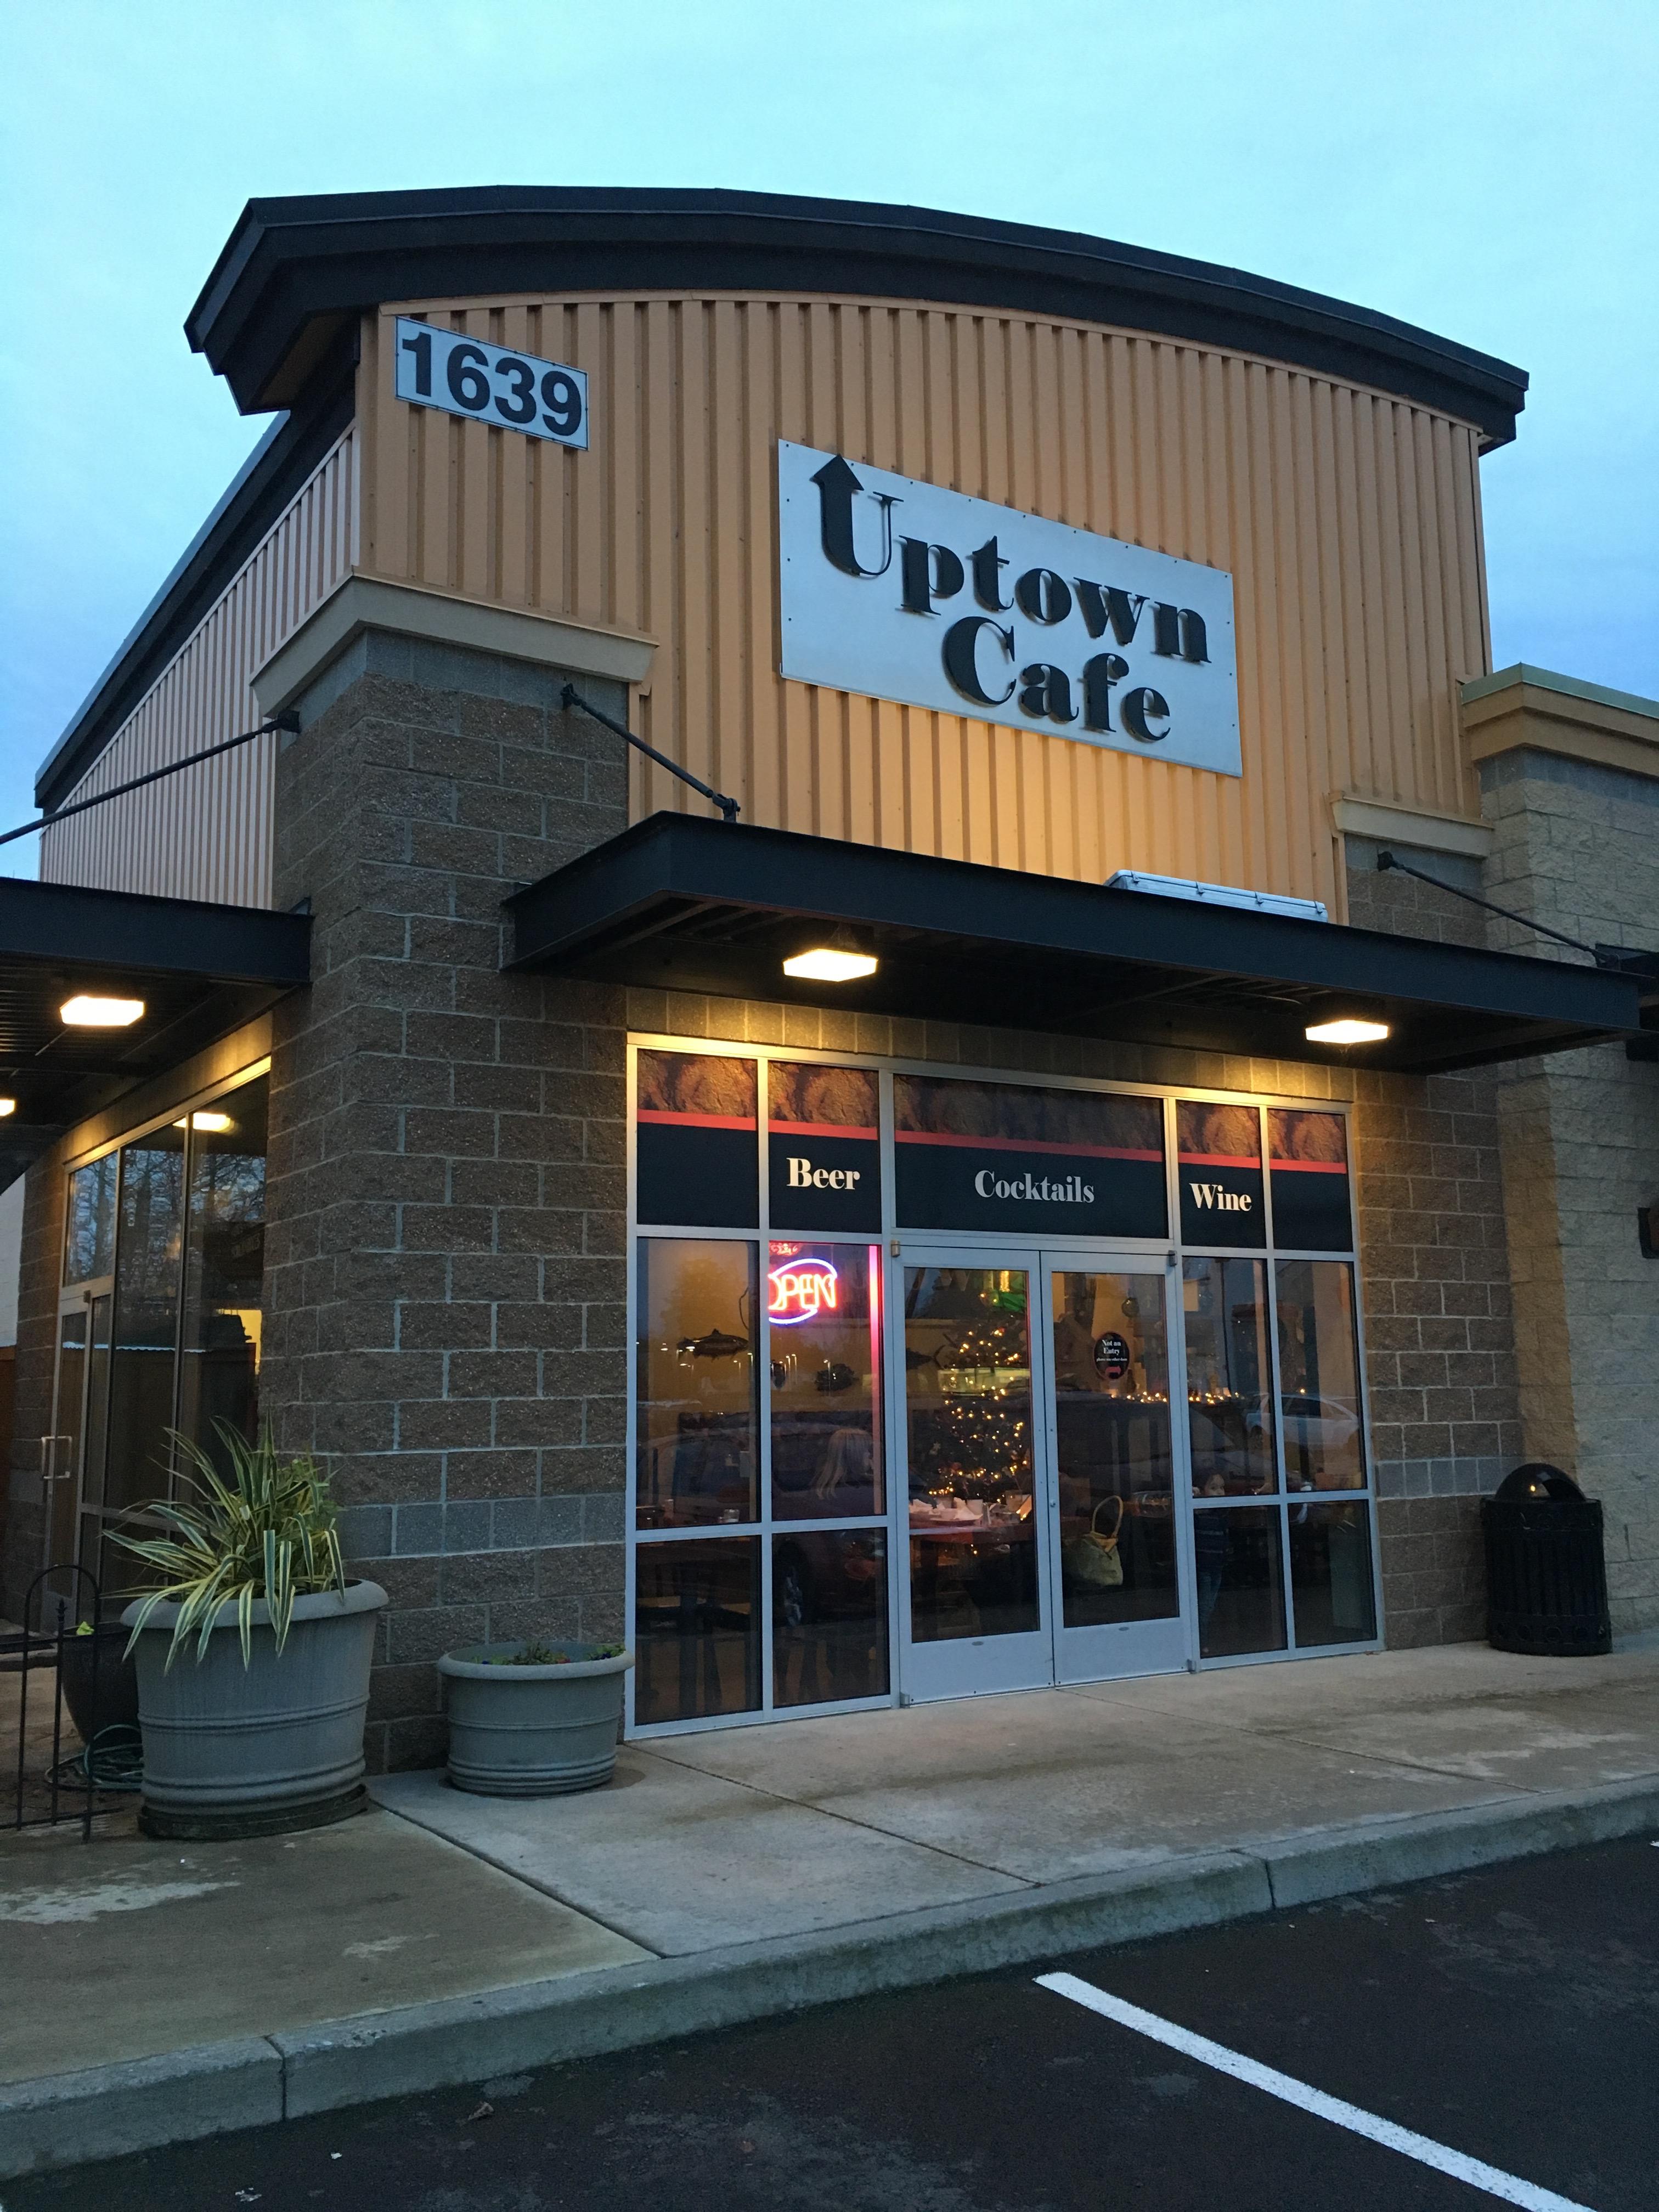 Uptown Cafe in Warrenton, Oregon